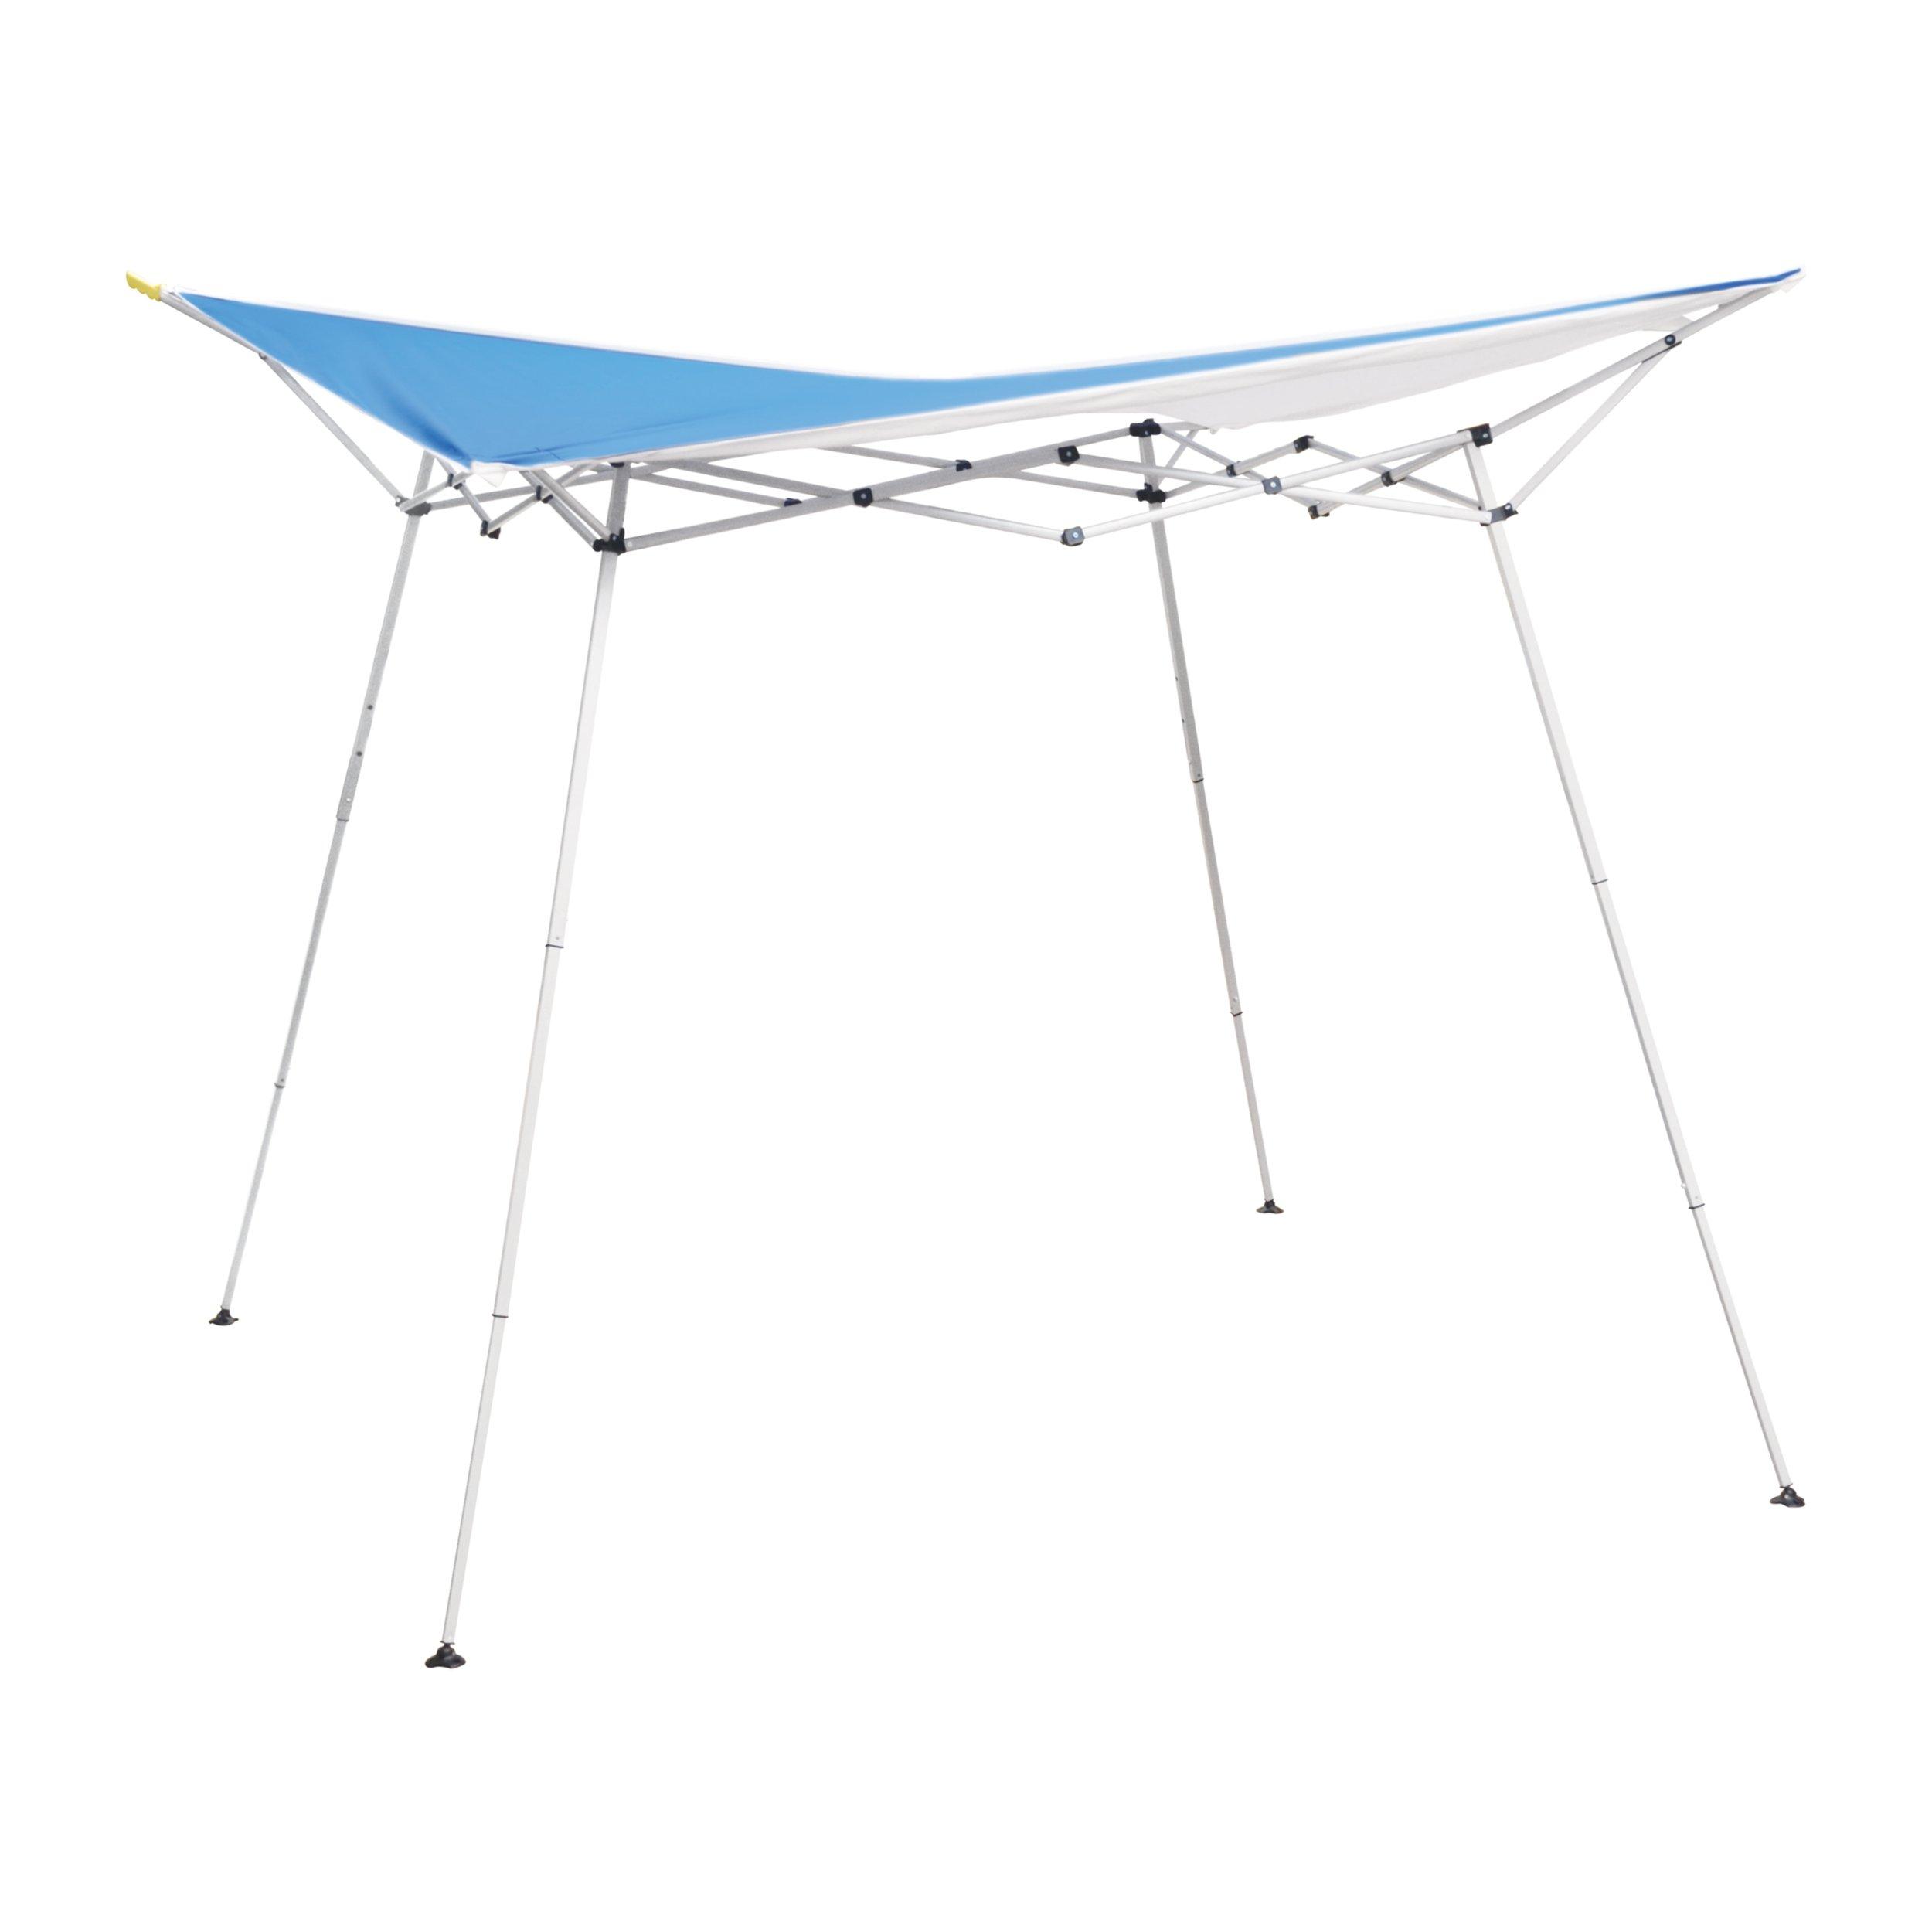 Caravan Canopy 8' x 8' Evo Shade Instant Canopy, Blue Top/White Frame